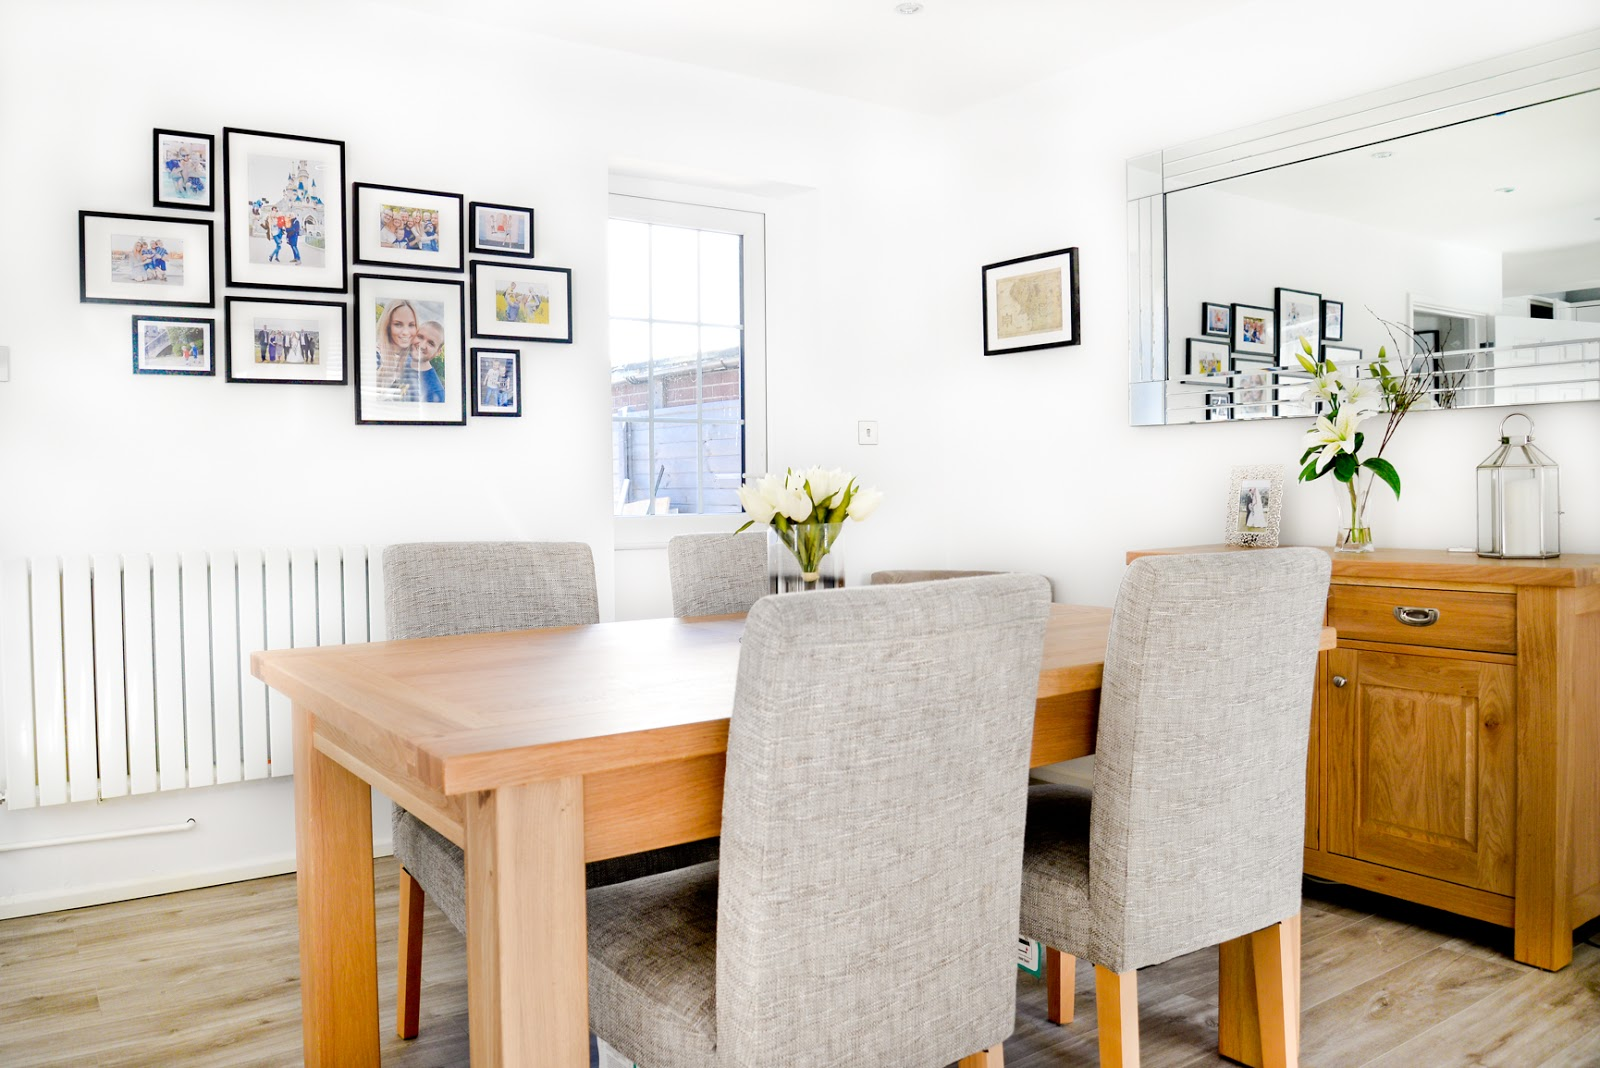 photo gallery wall, white modern Scandinavian style kitchen diner, modern white kitchen, modern rustic kitchen,